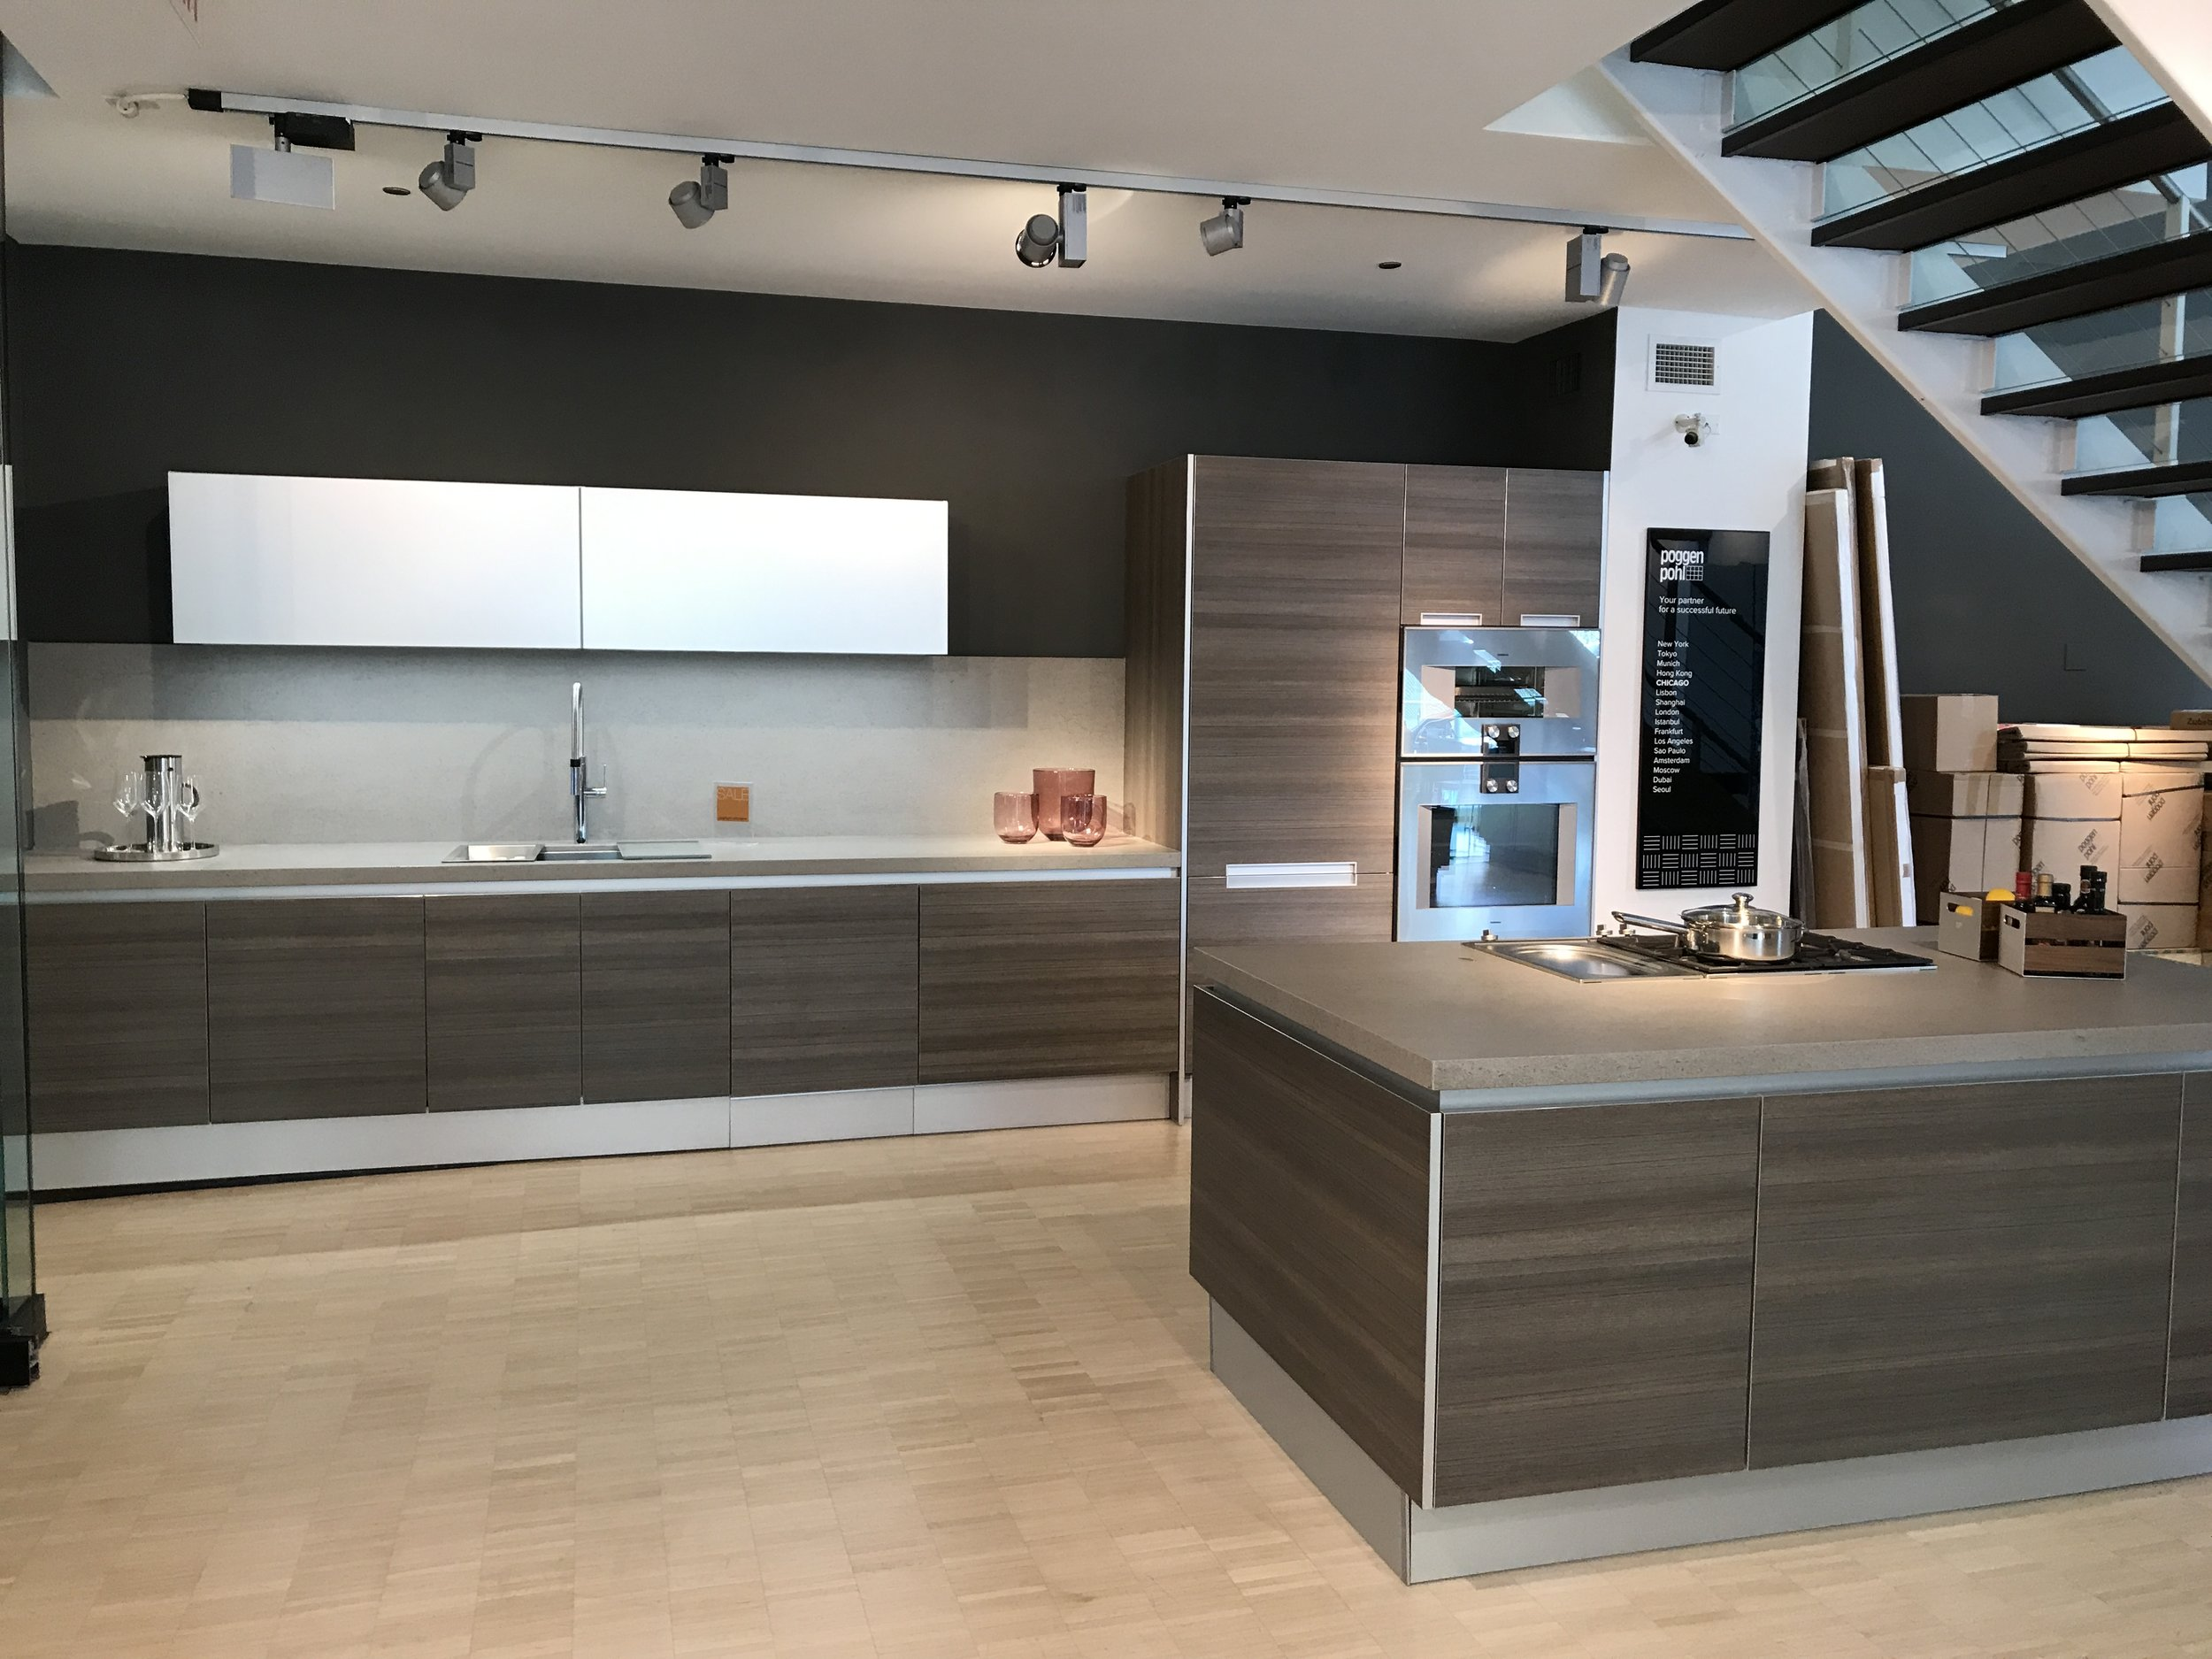 complete kitchen danze parma faucet new poggenpohl appliances marble counter gaggenau